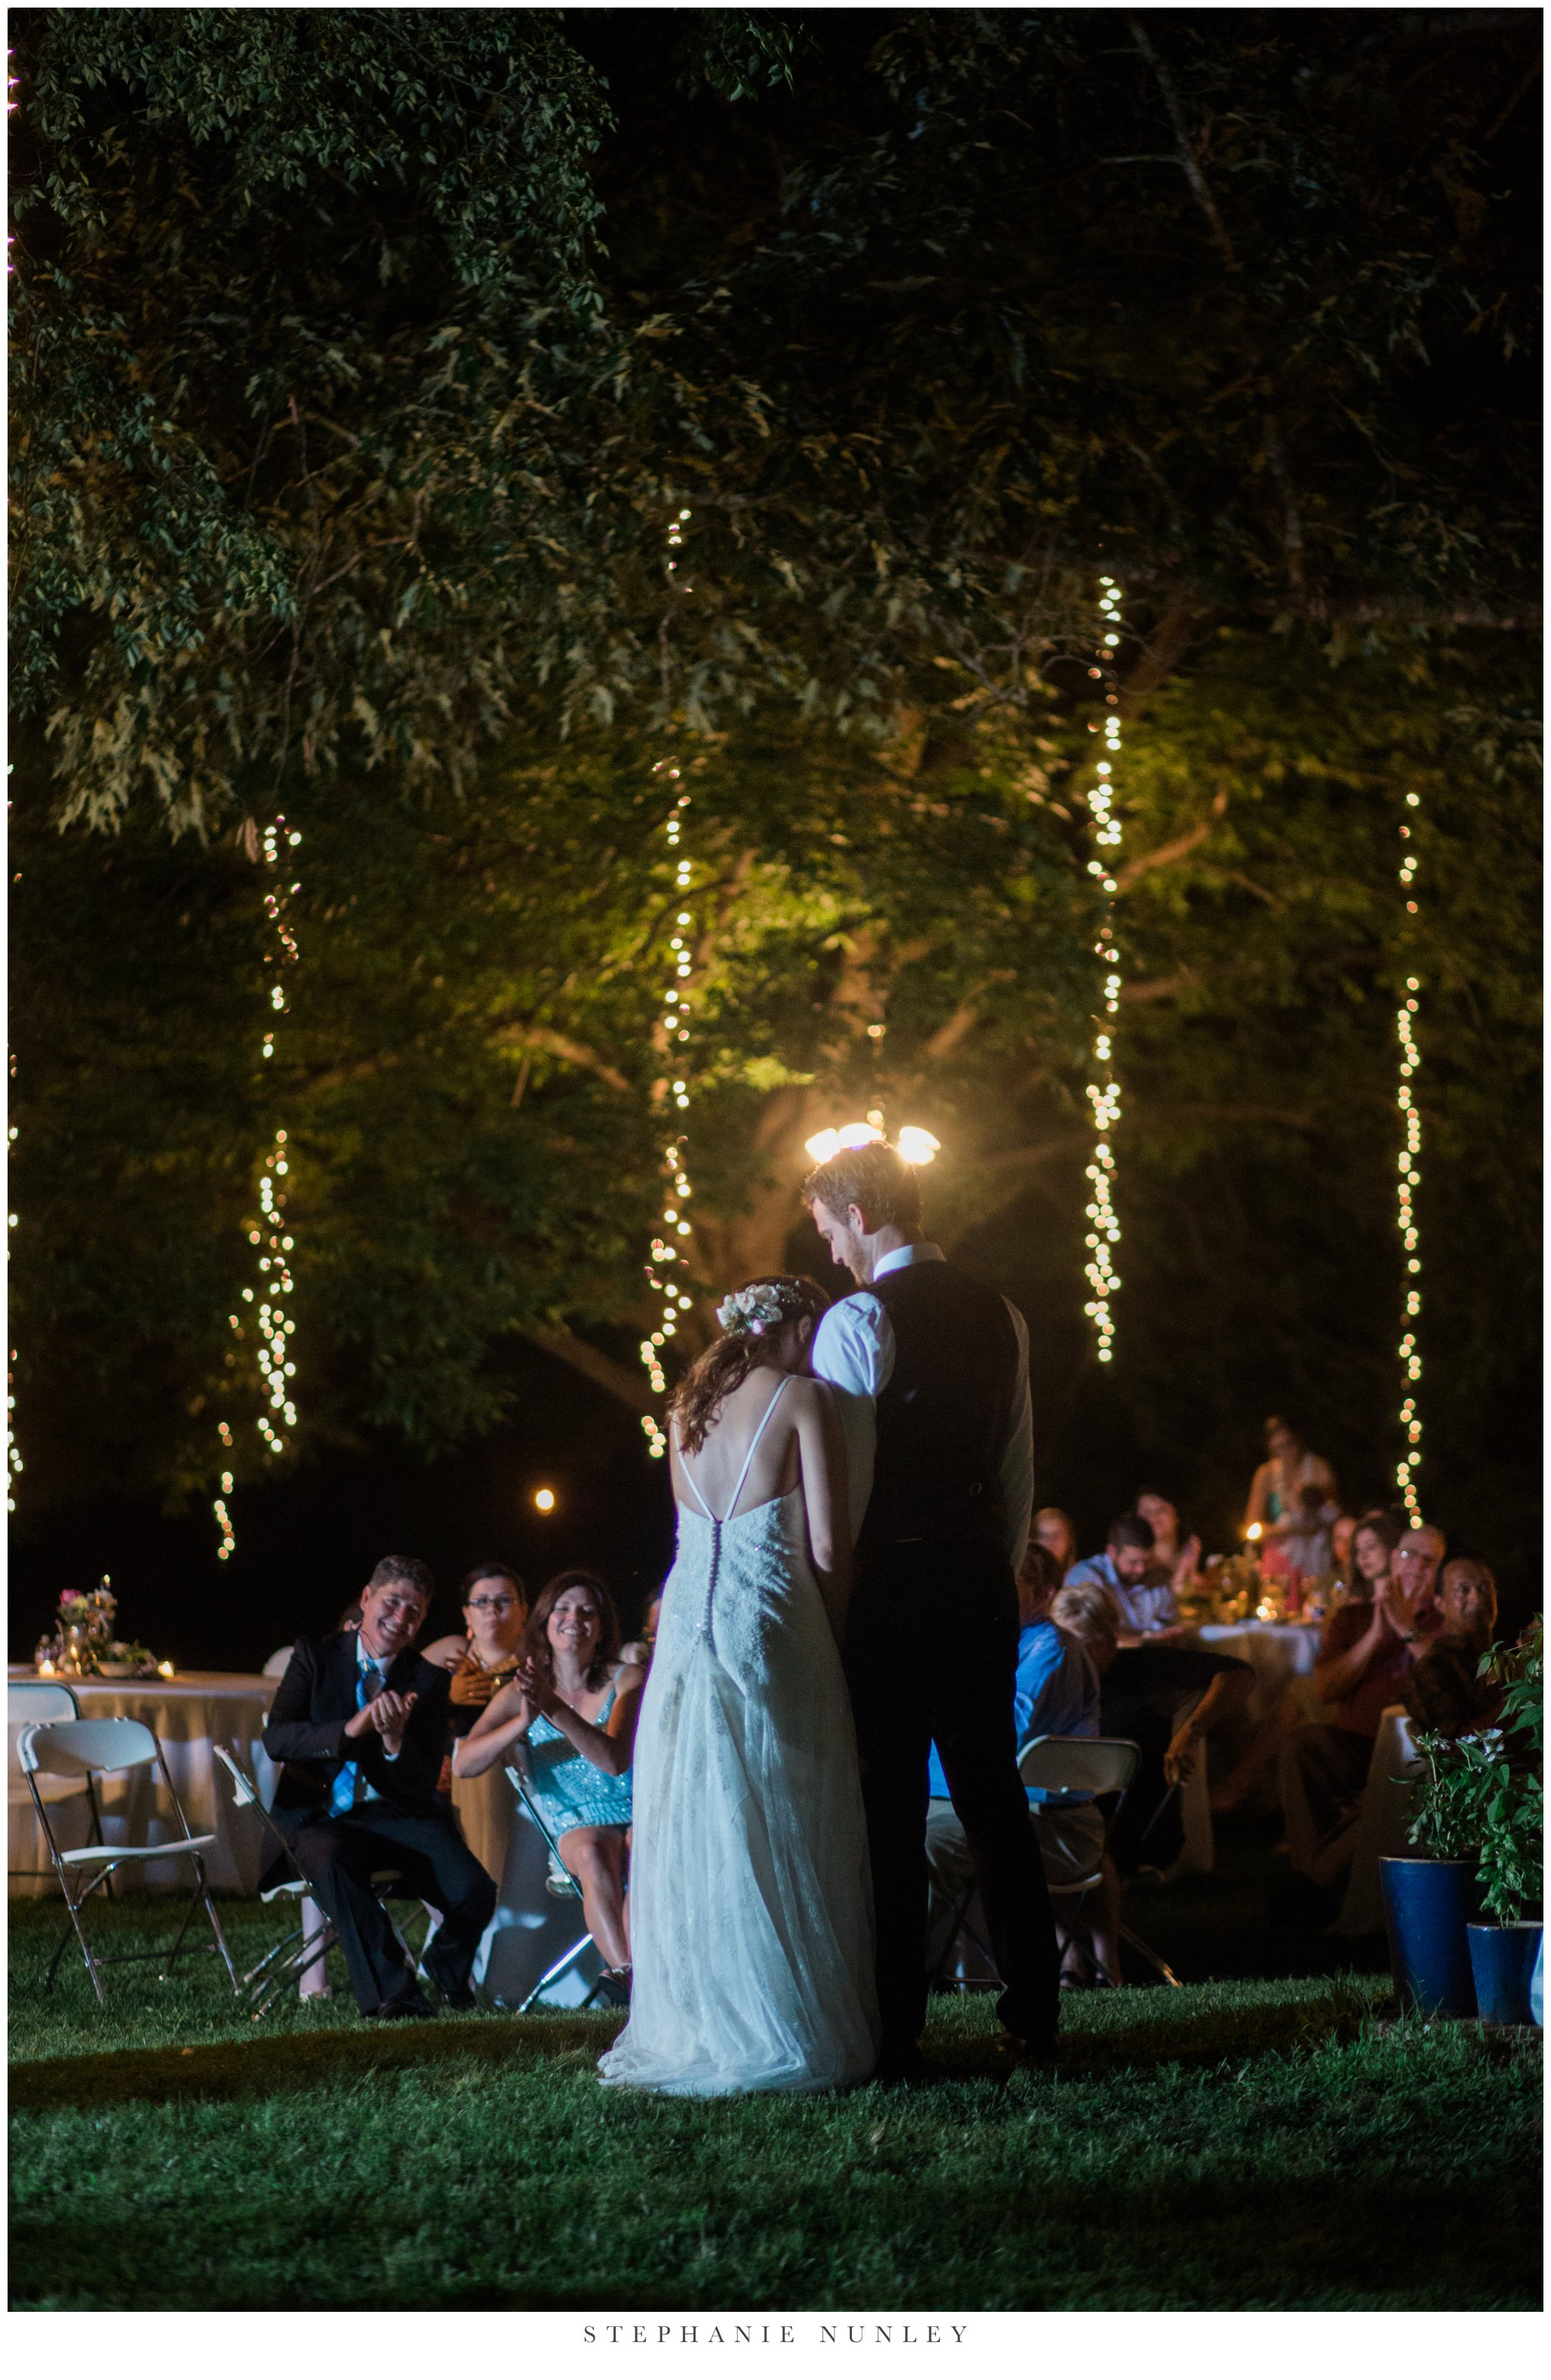 classic-elegant-backyard-wedding-photos-0073.jpg